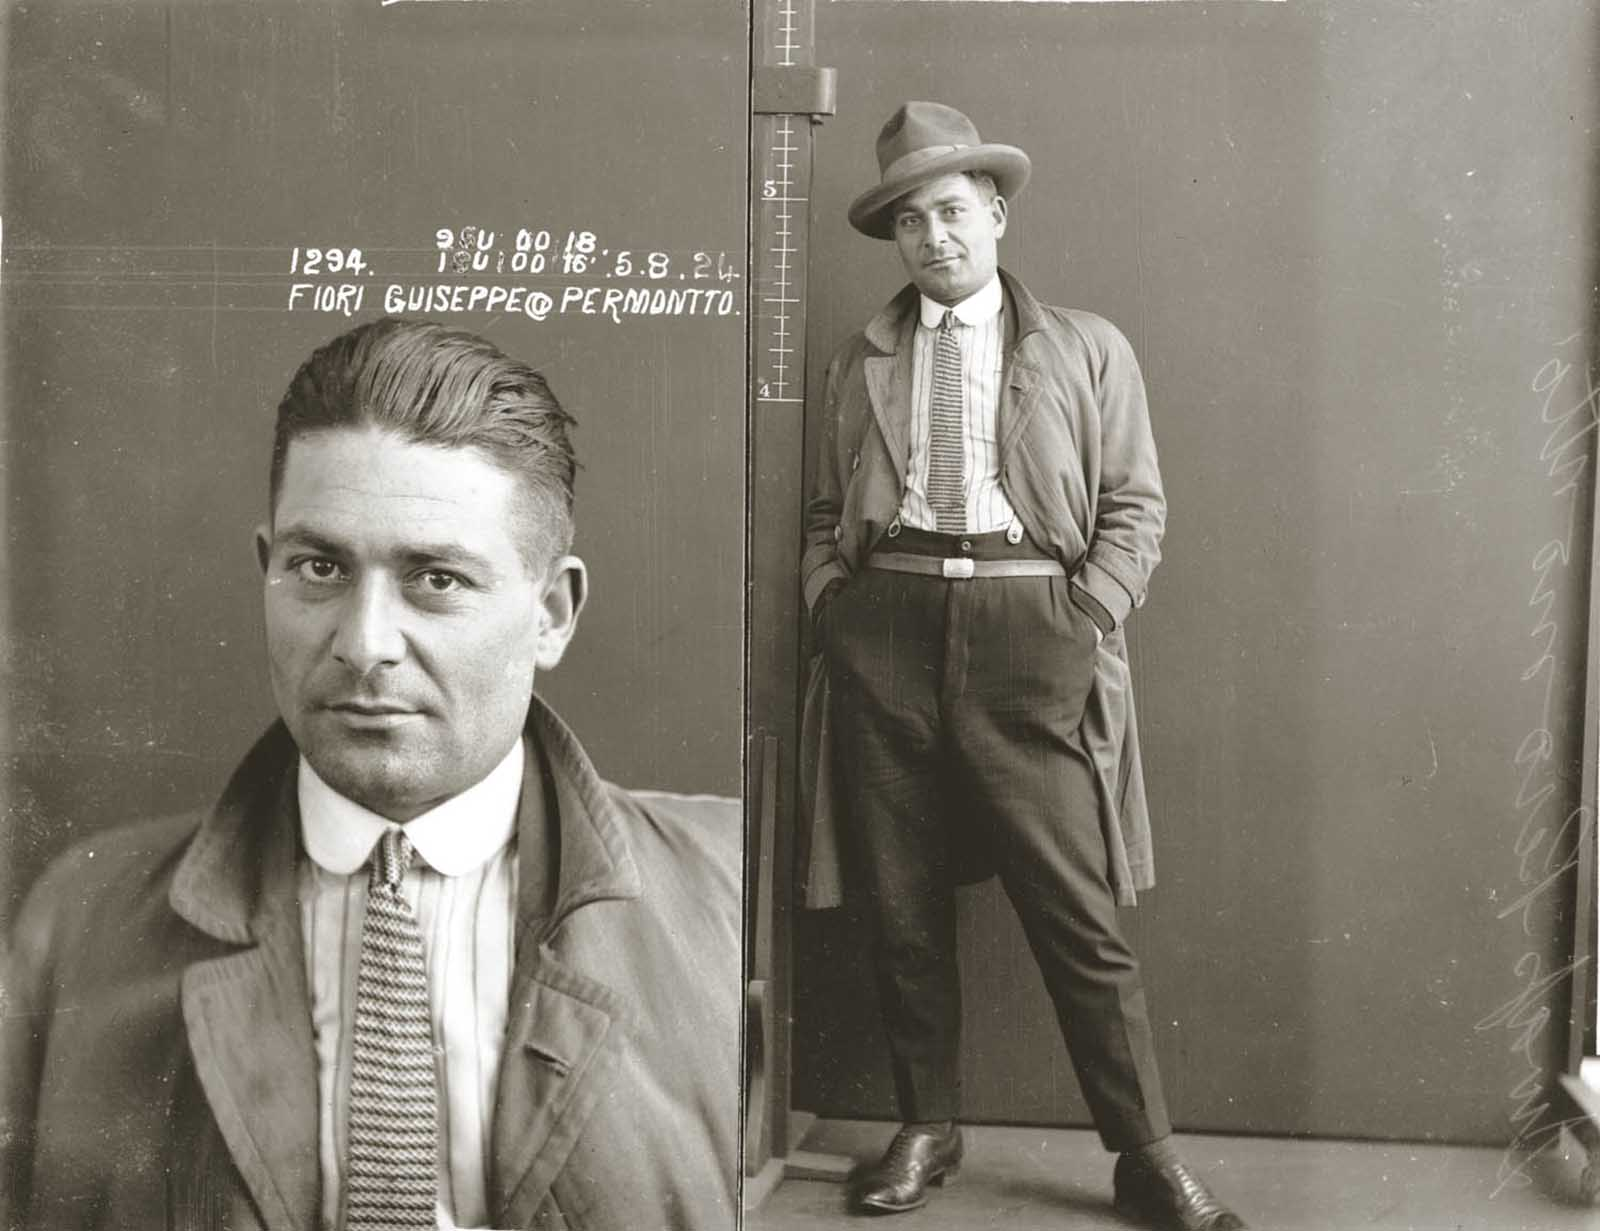 Guiseppe Fiori, alias Permontto. 1924.